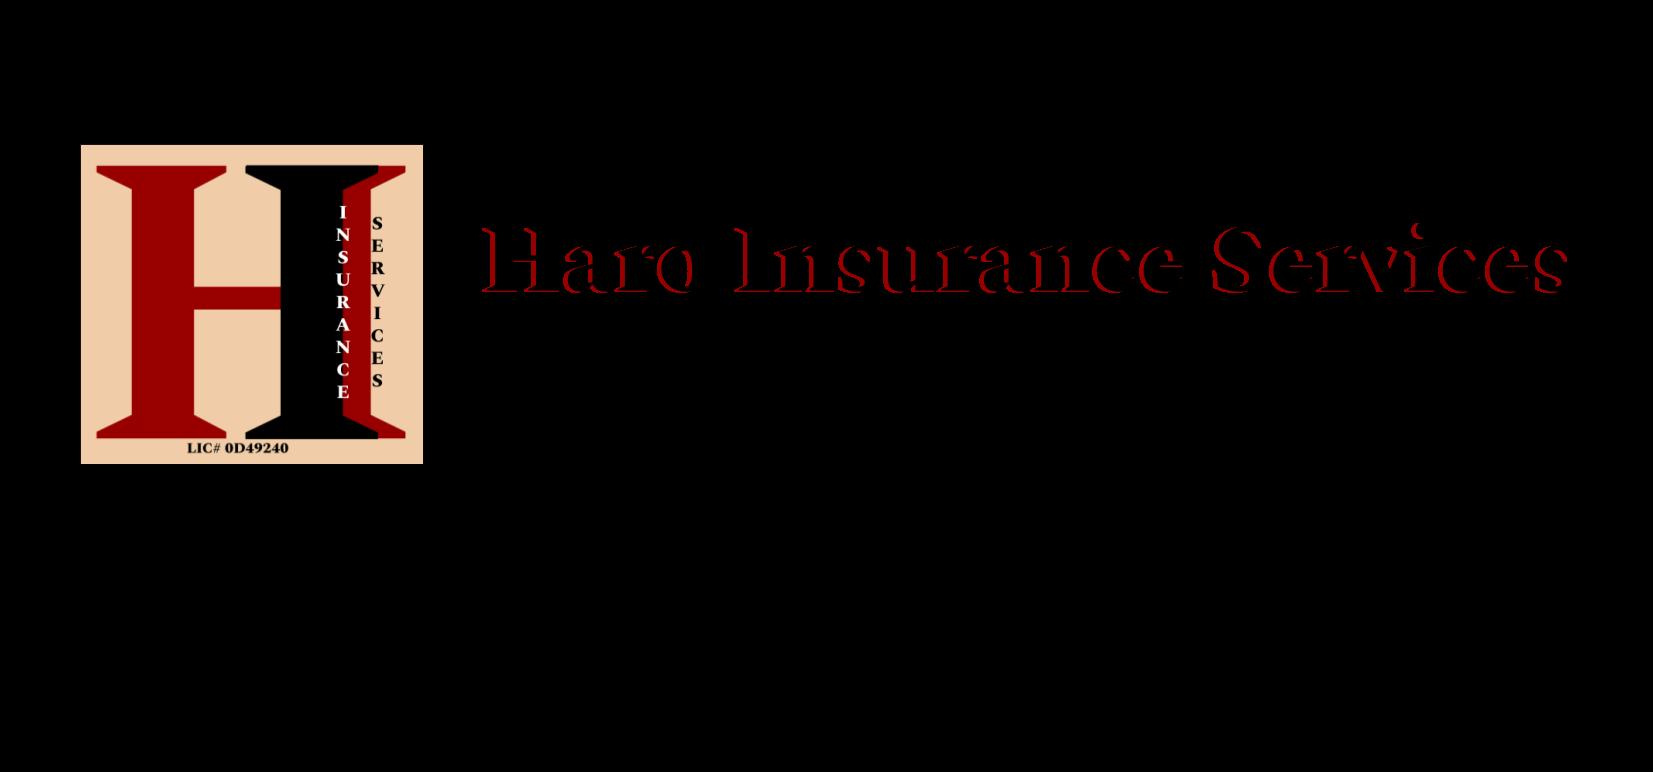 Haro Insurance Services